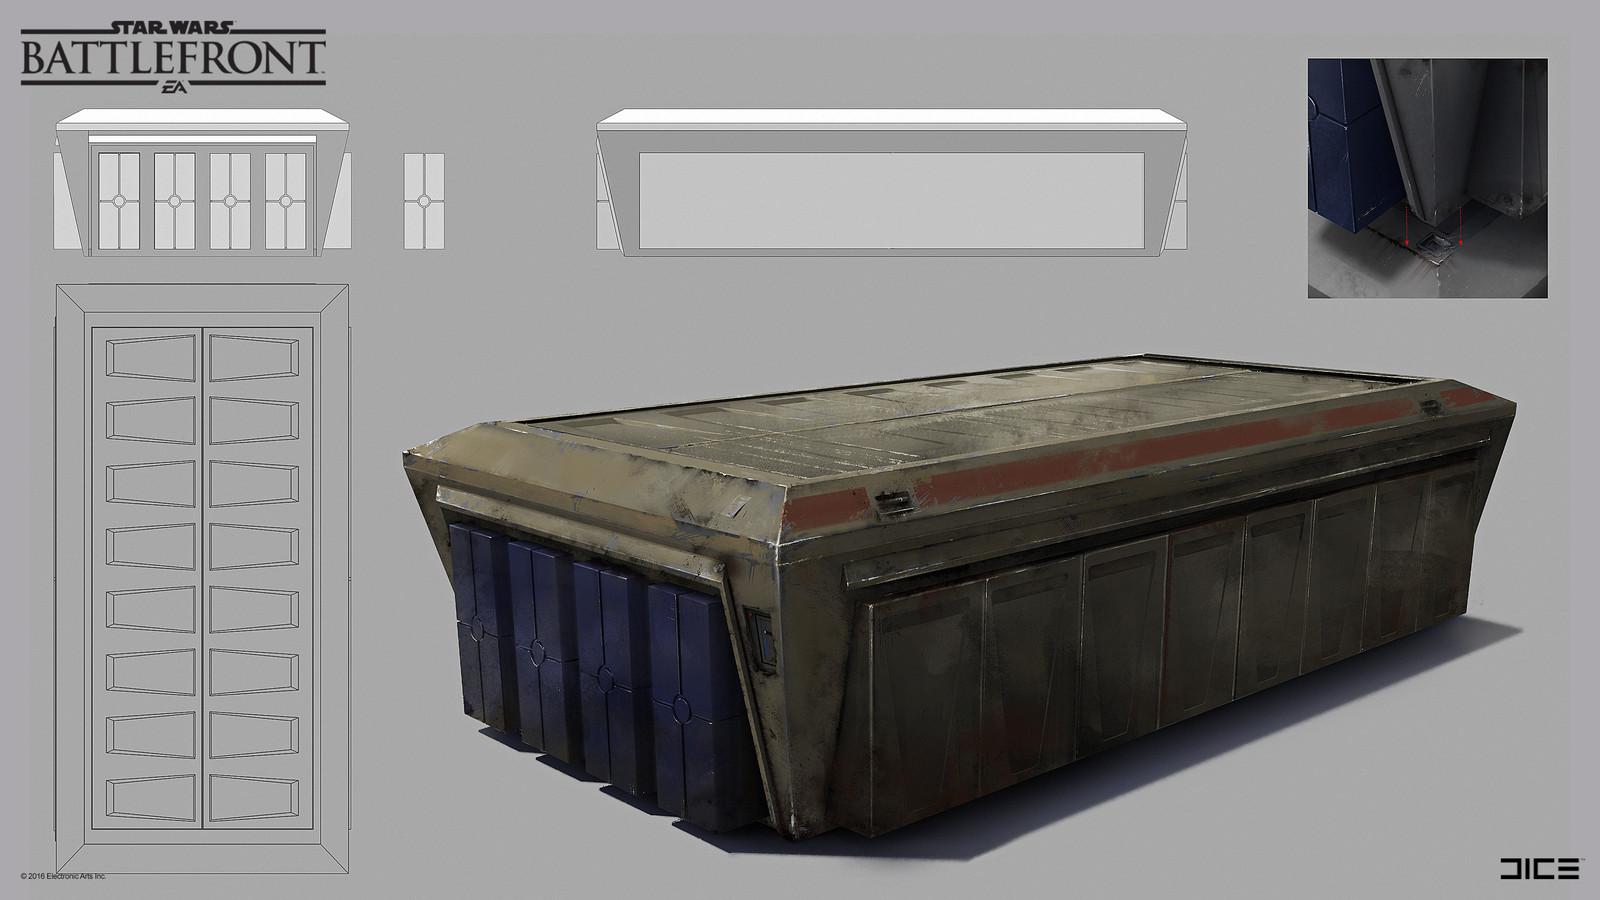 Rebel container on Sullust Concept Art for the 2015 Star Wars Battlefront game. (2014)